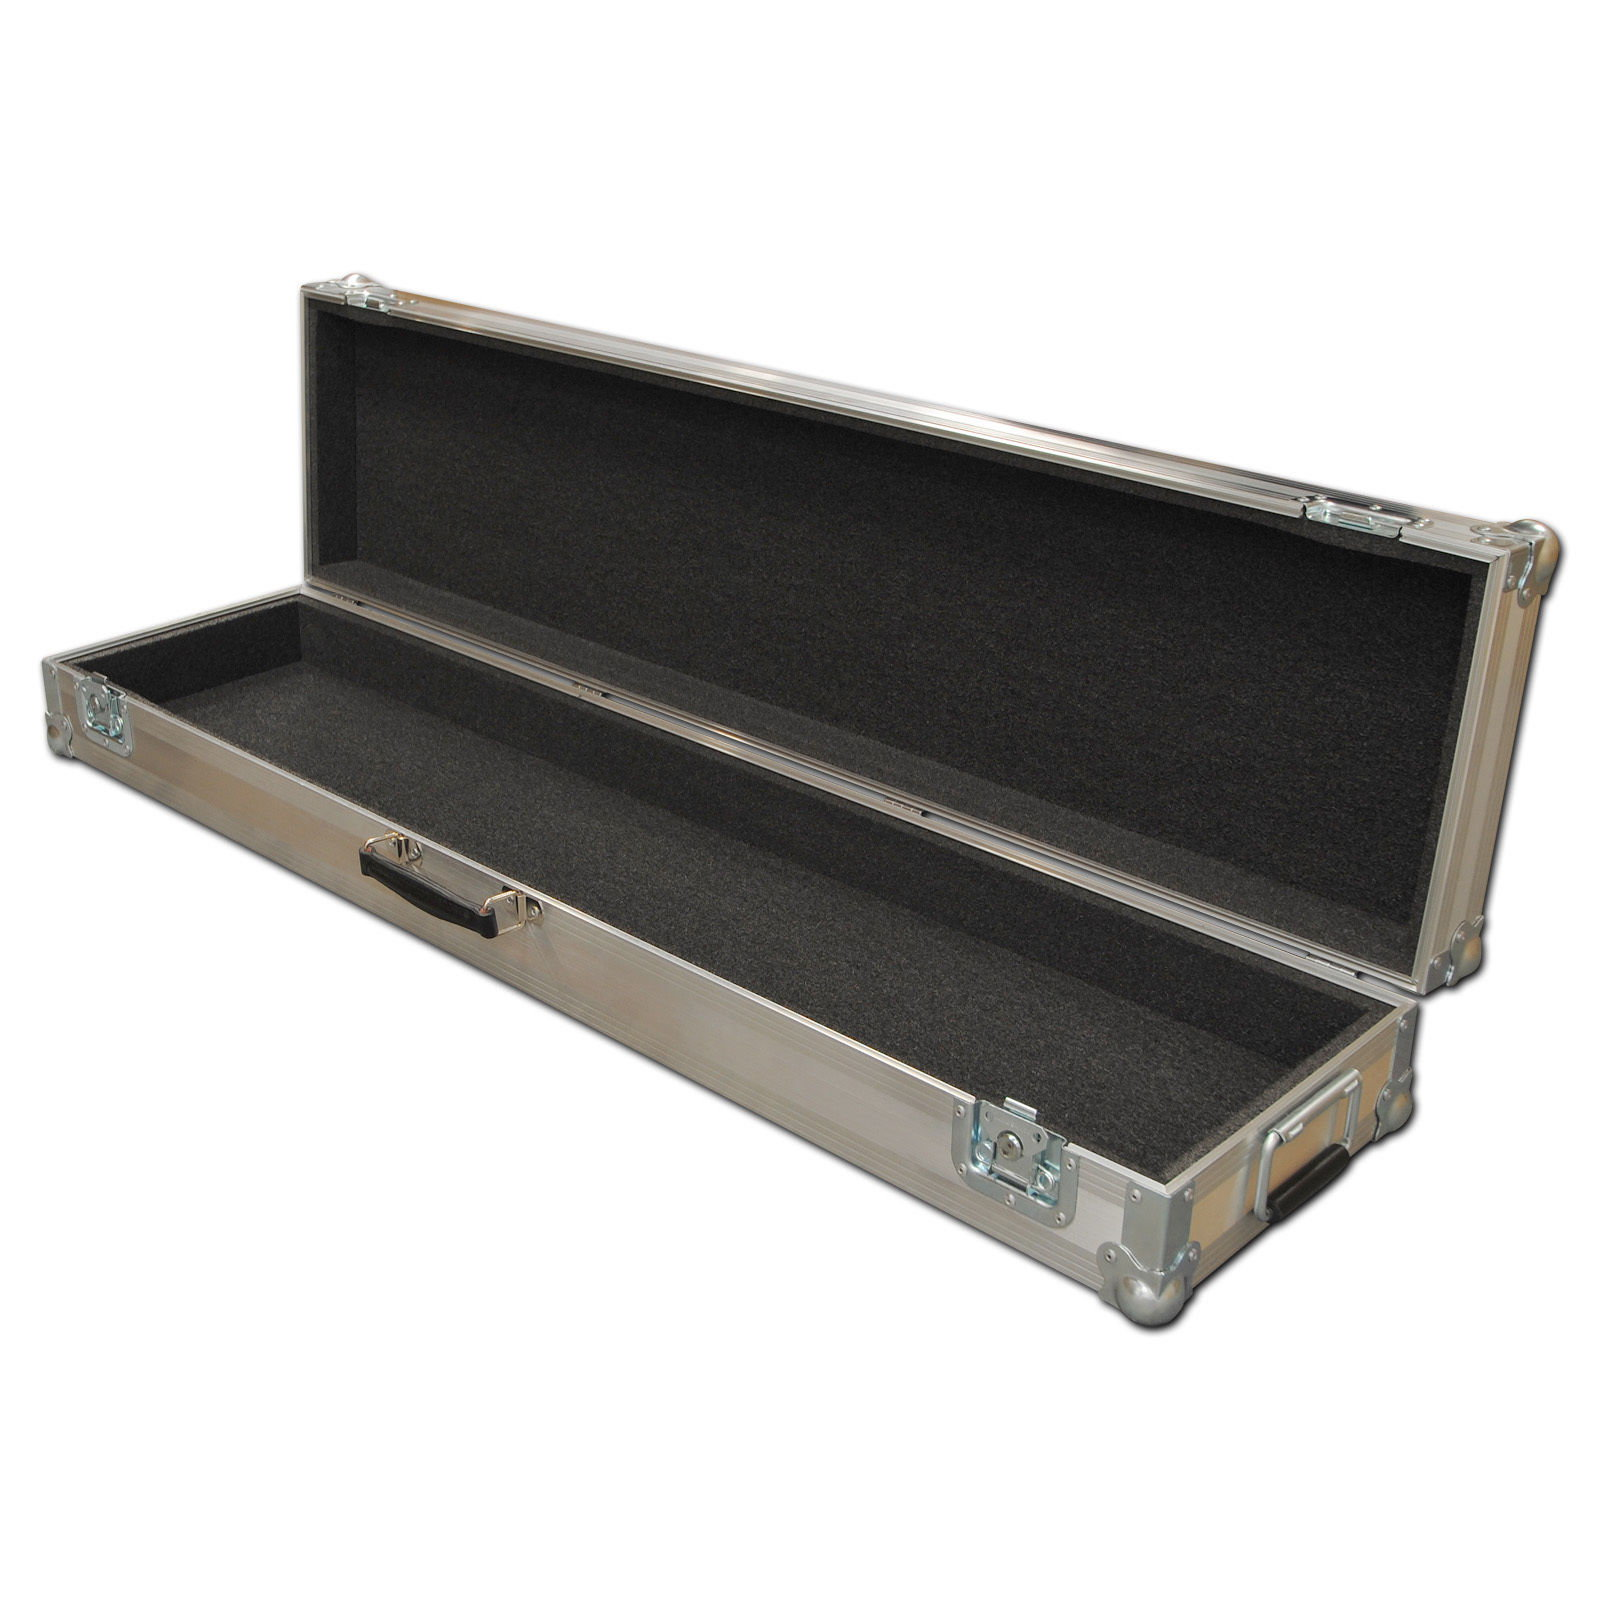 88 note keyboard flight case for yamaha cp4. Black Bedroom Furniture Sets. Home Design Ideas